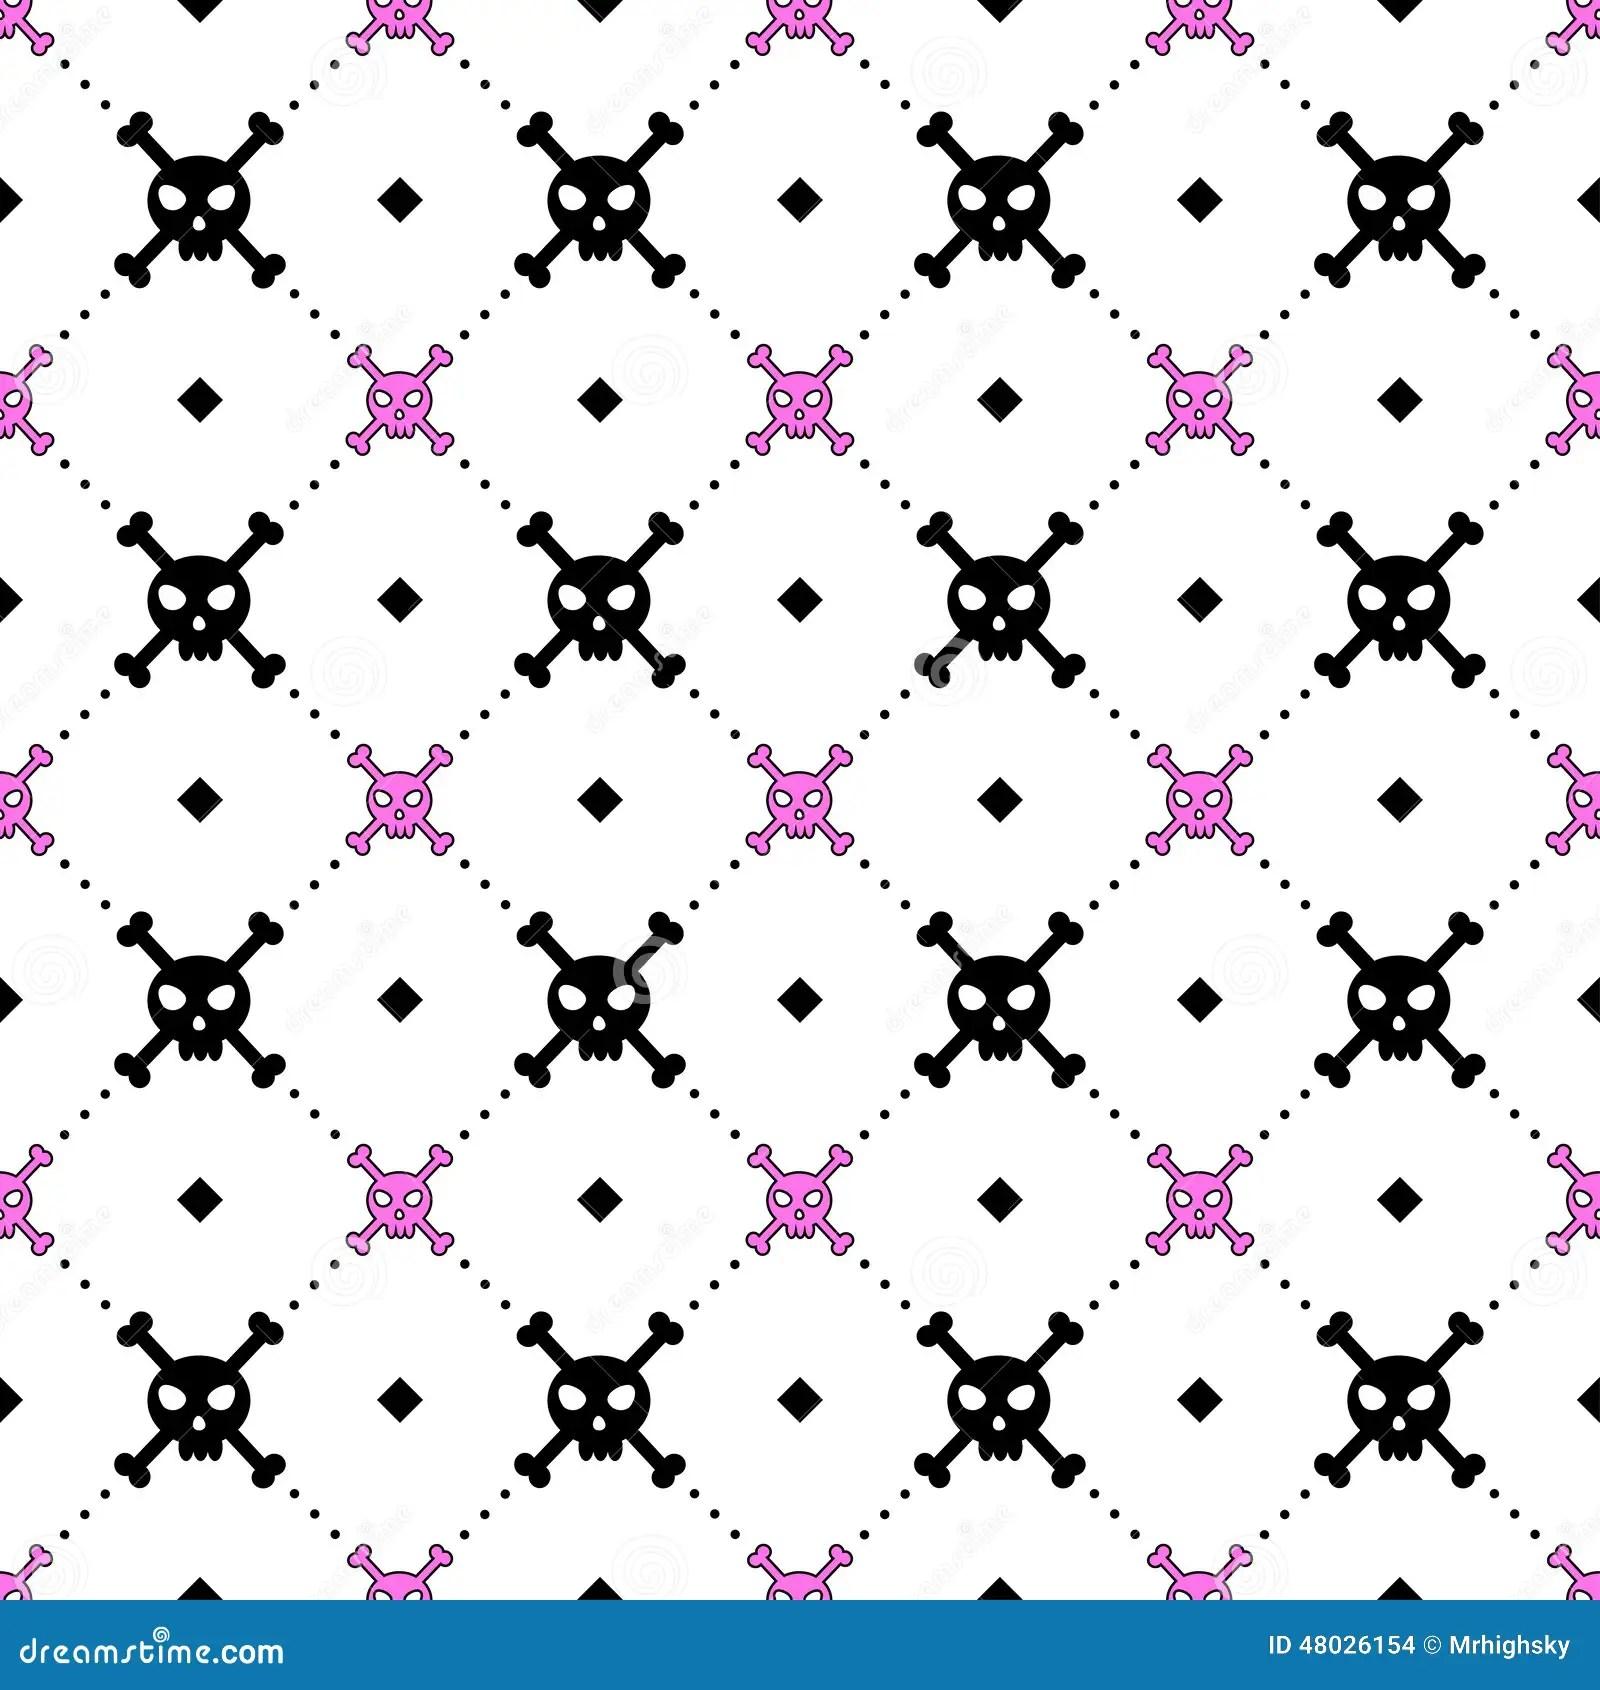 Skeleton Pattern Wallpaper Cute Girly Skull And Bones Pattern Stock Vector Image 48026154